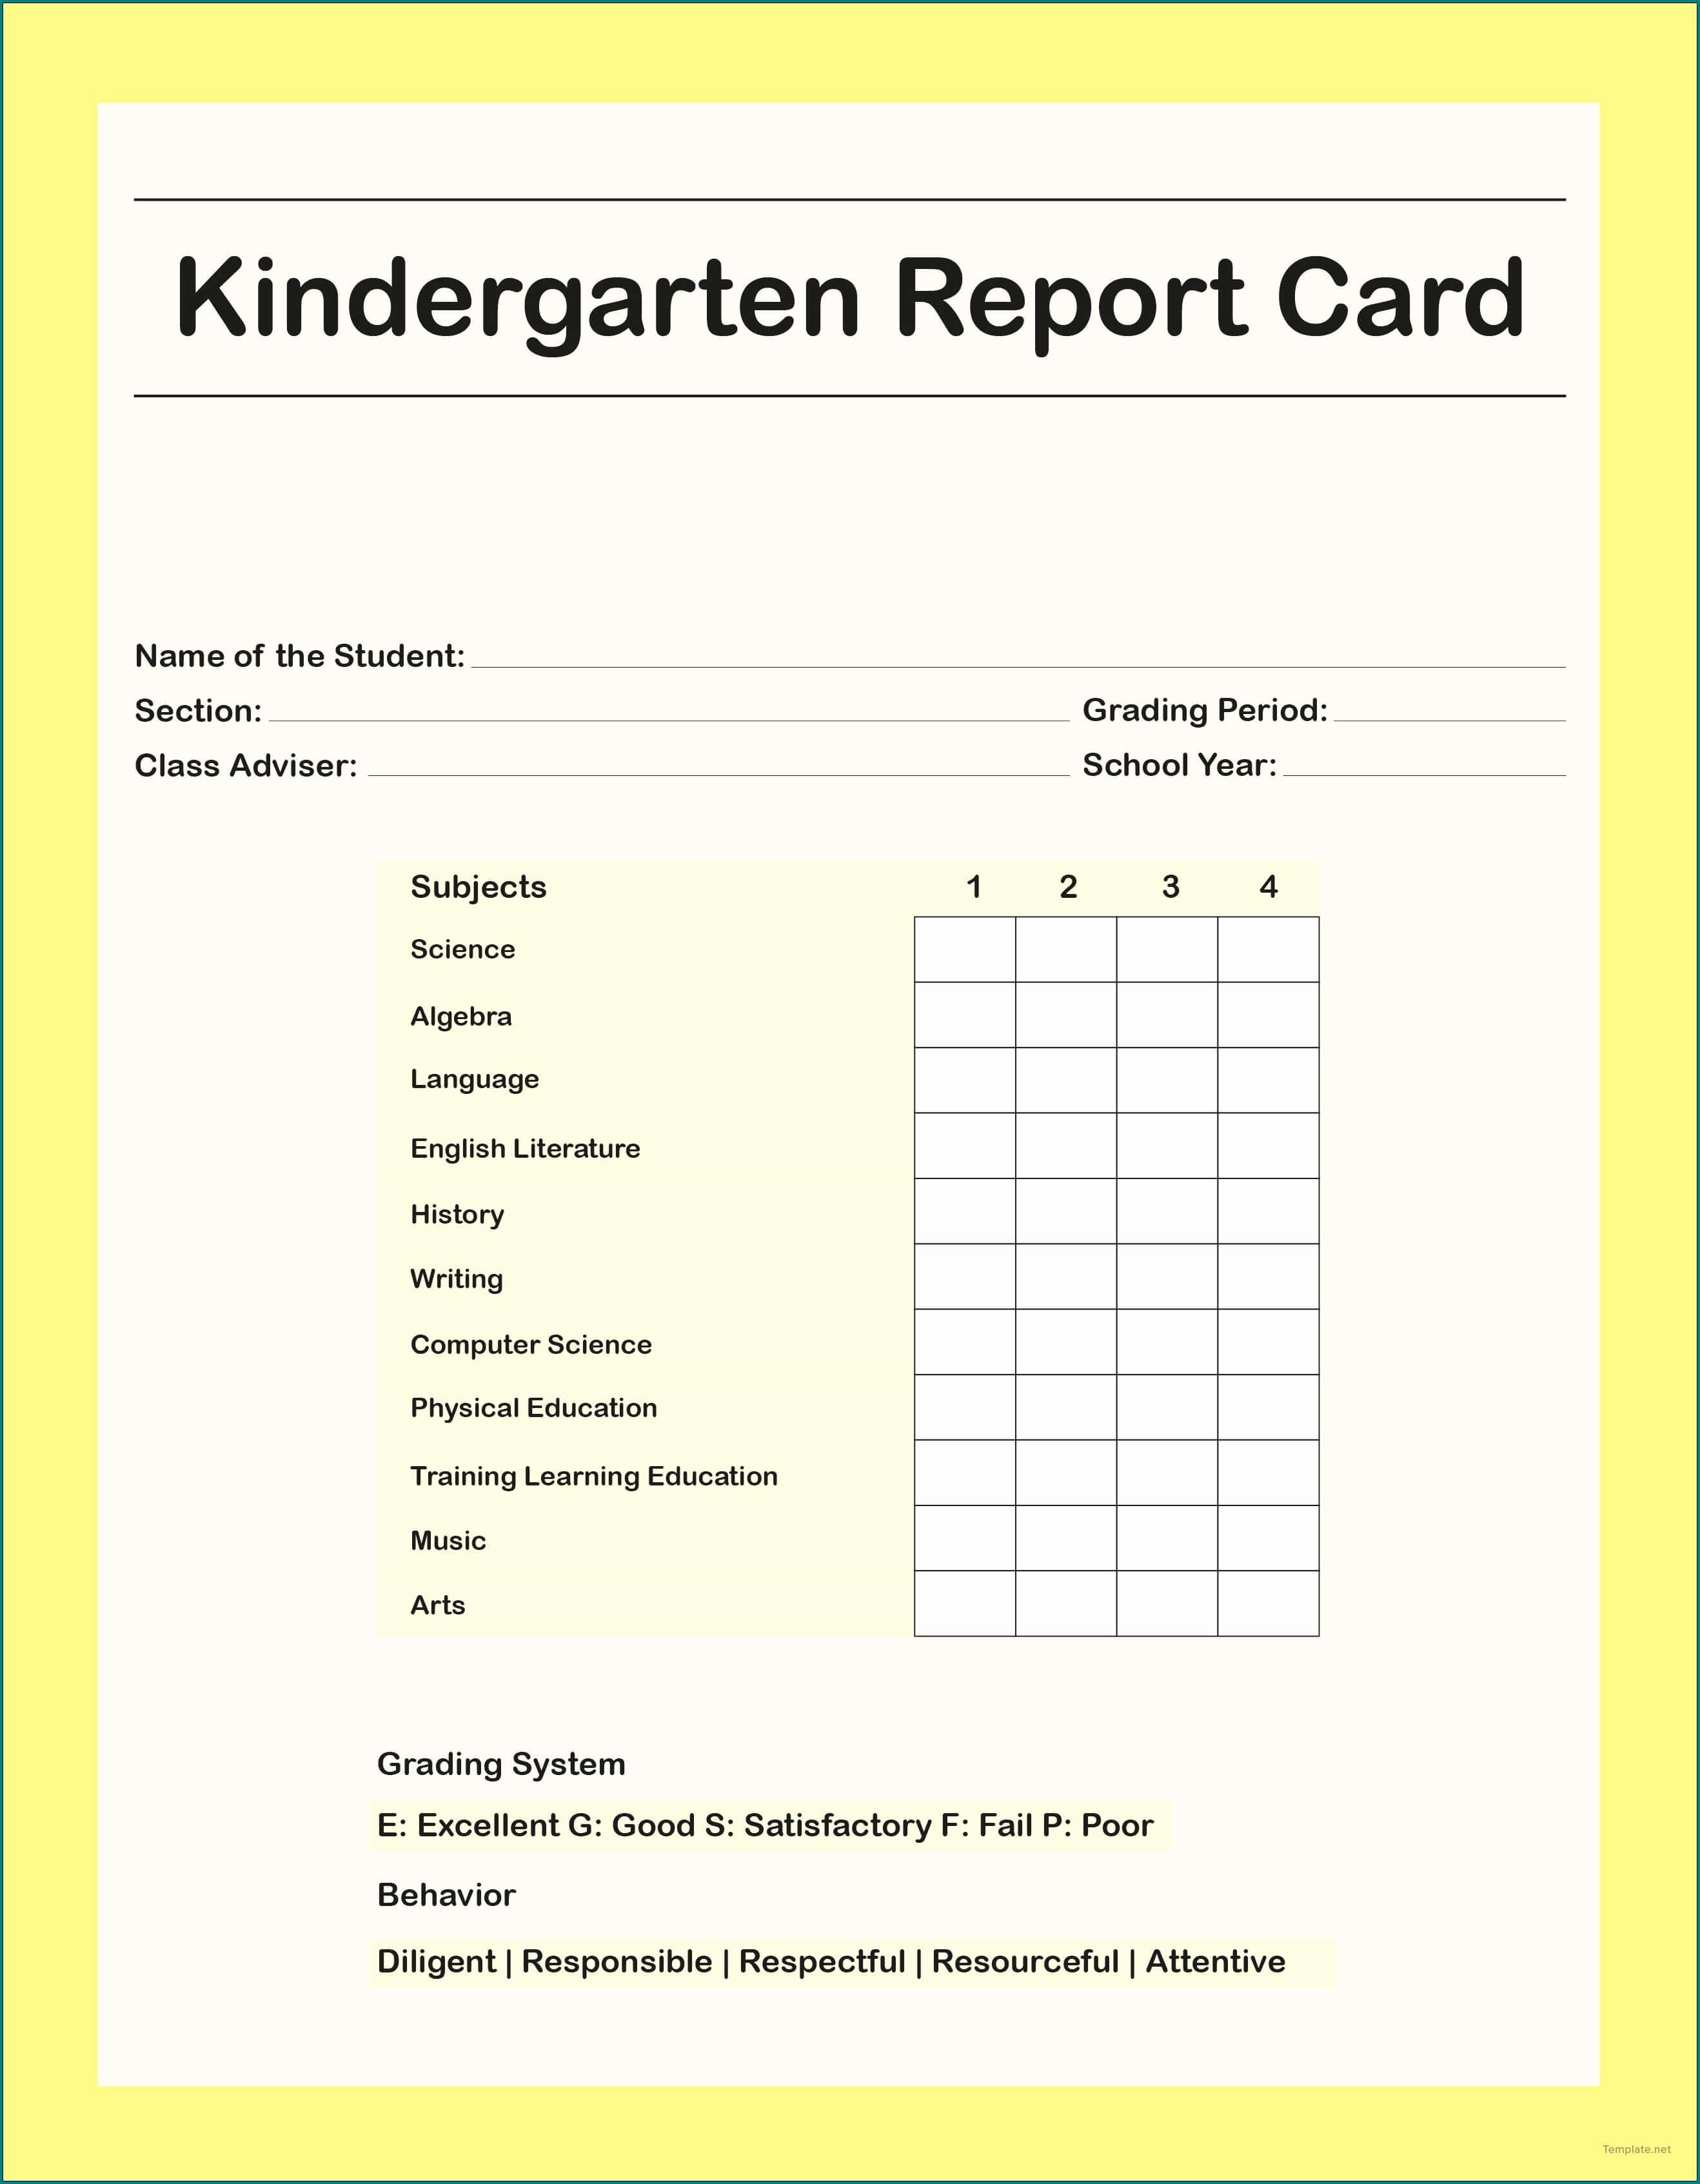 ᐅ Free Customizable Homeschool Report Card Template #604 for Homeschool Report Card Template